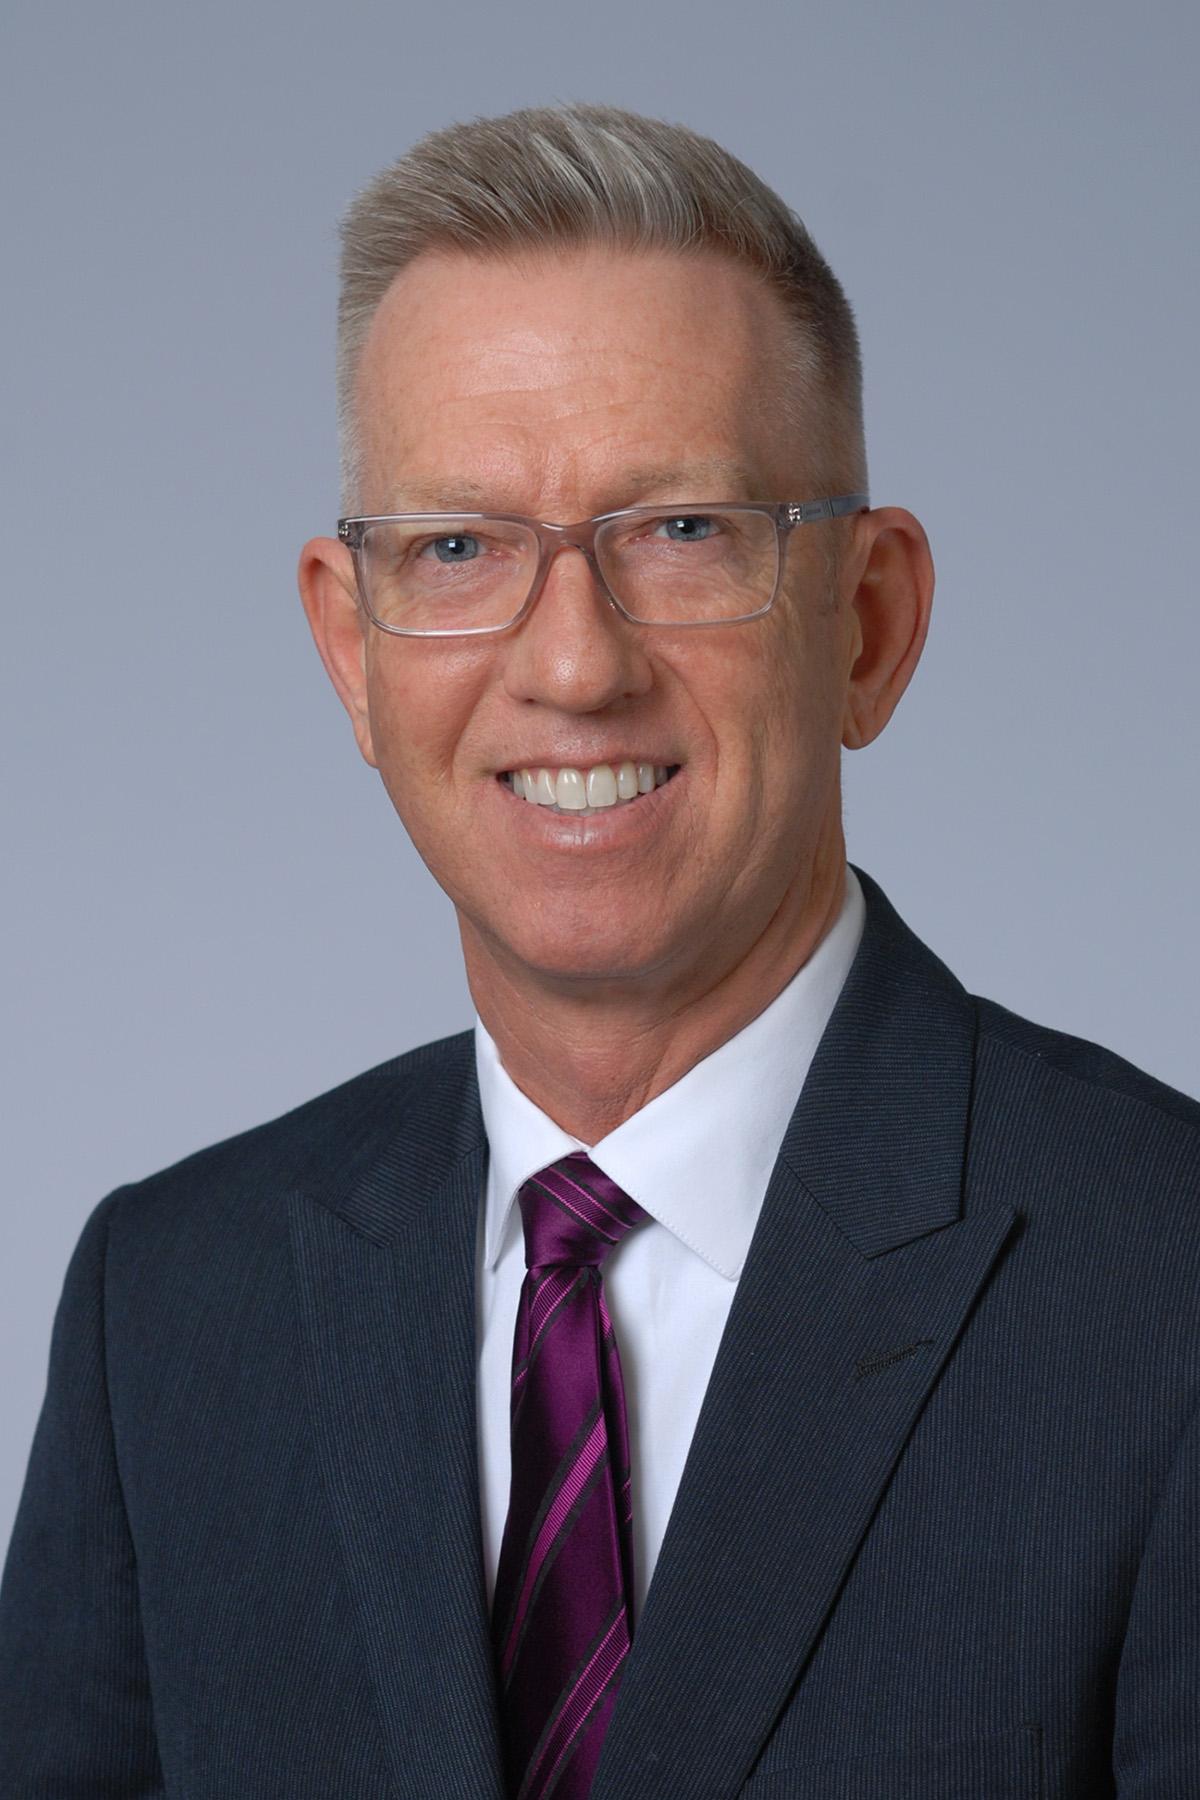 Fellowship Indiana University, School of Medicine